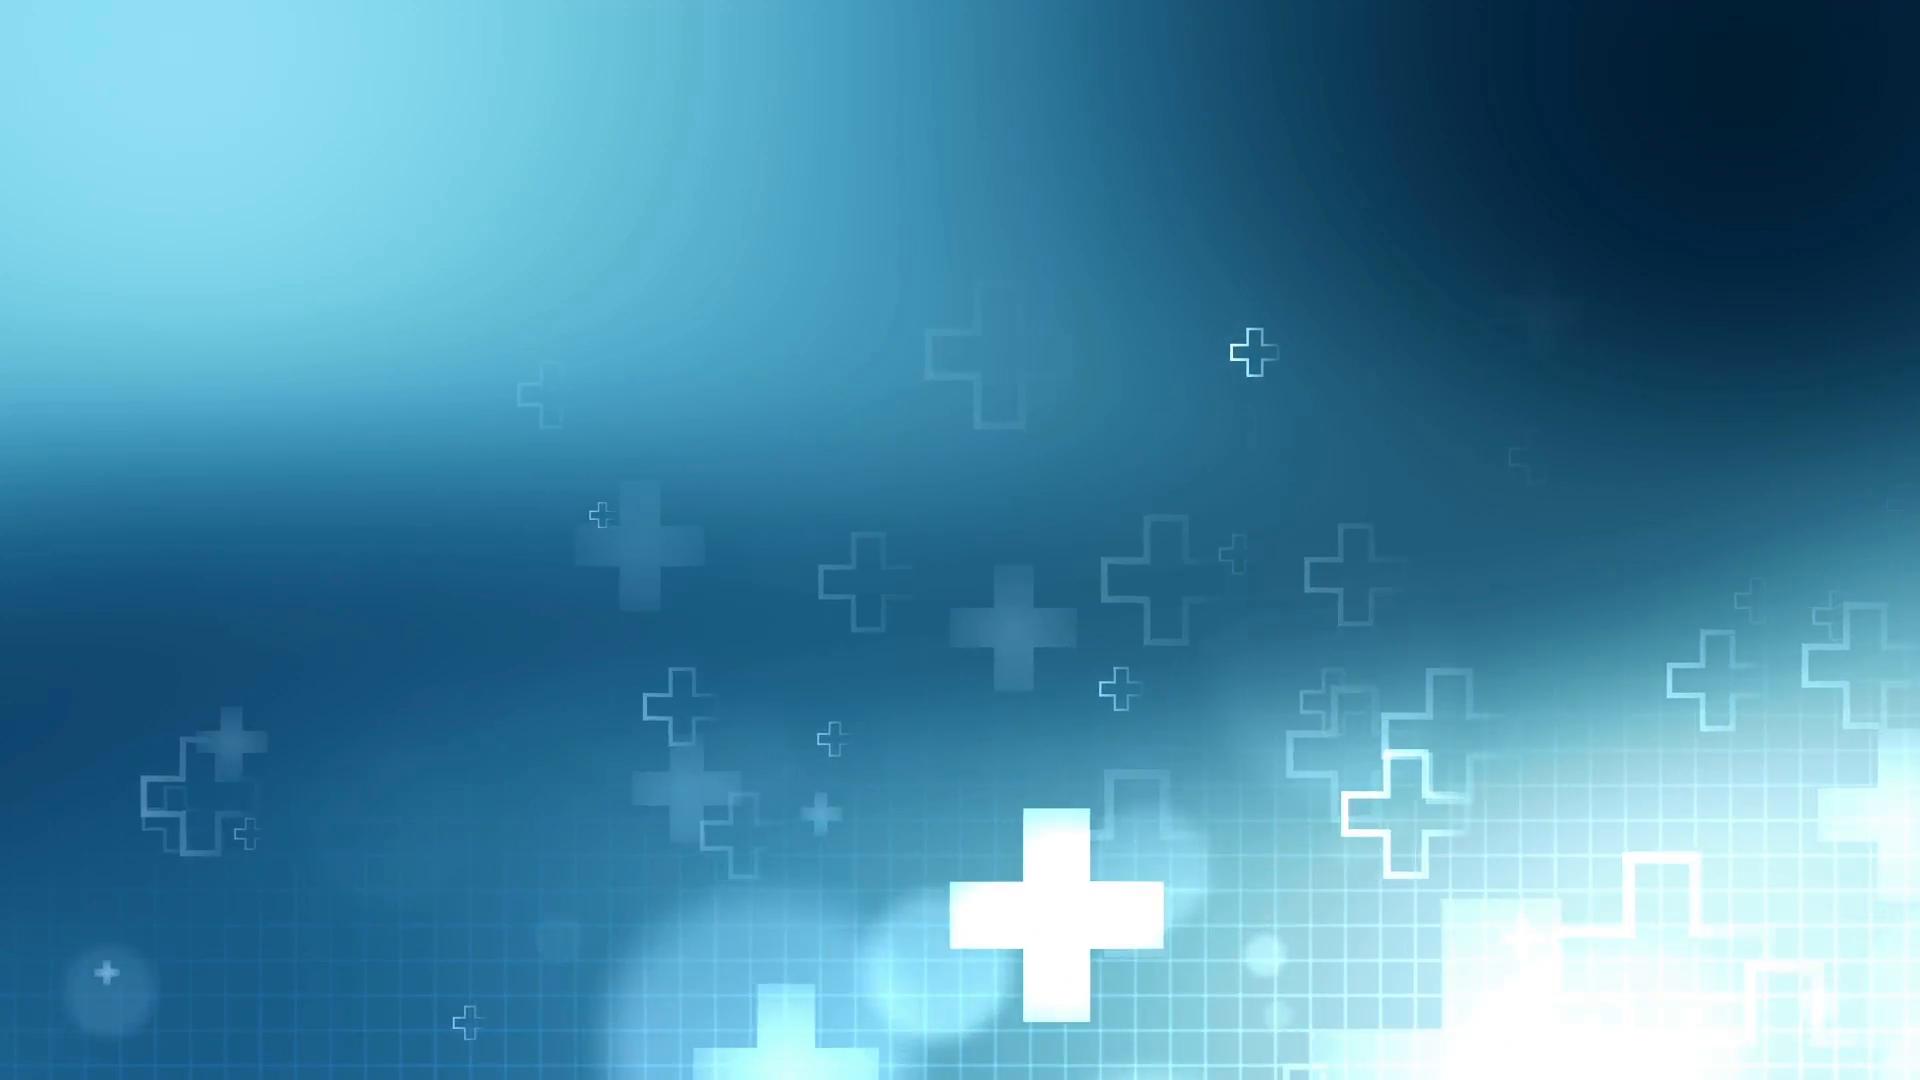 Medical Background Free Image Background For Hospital Website 1920x1080 Wallpaper Teahub Io